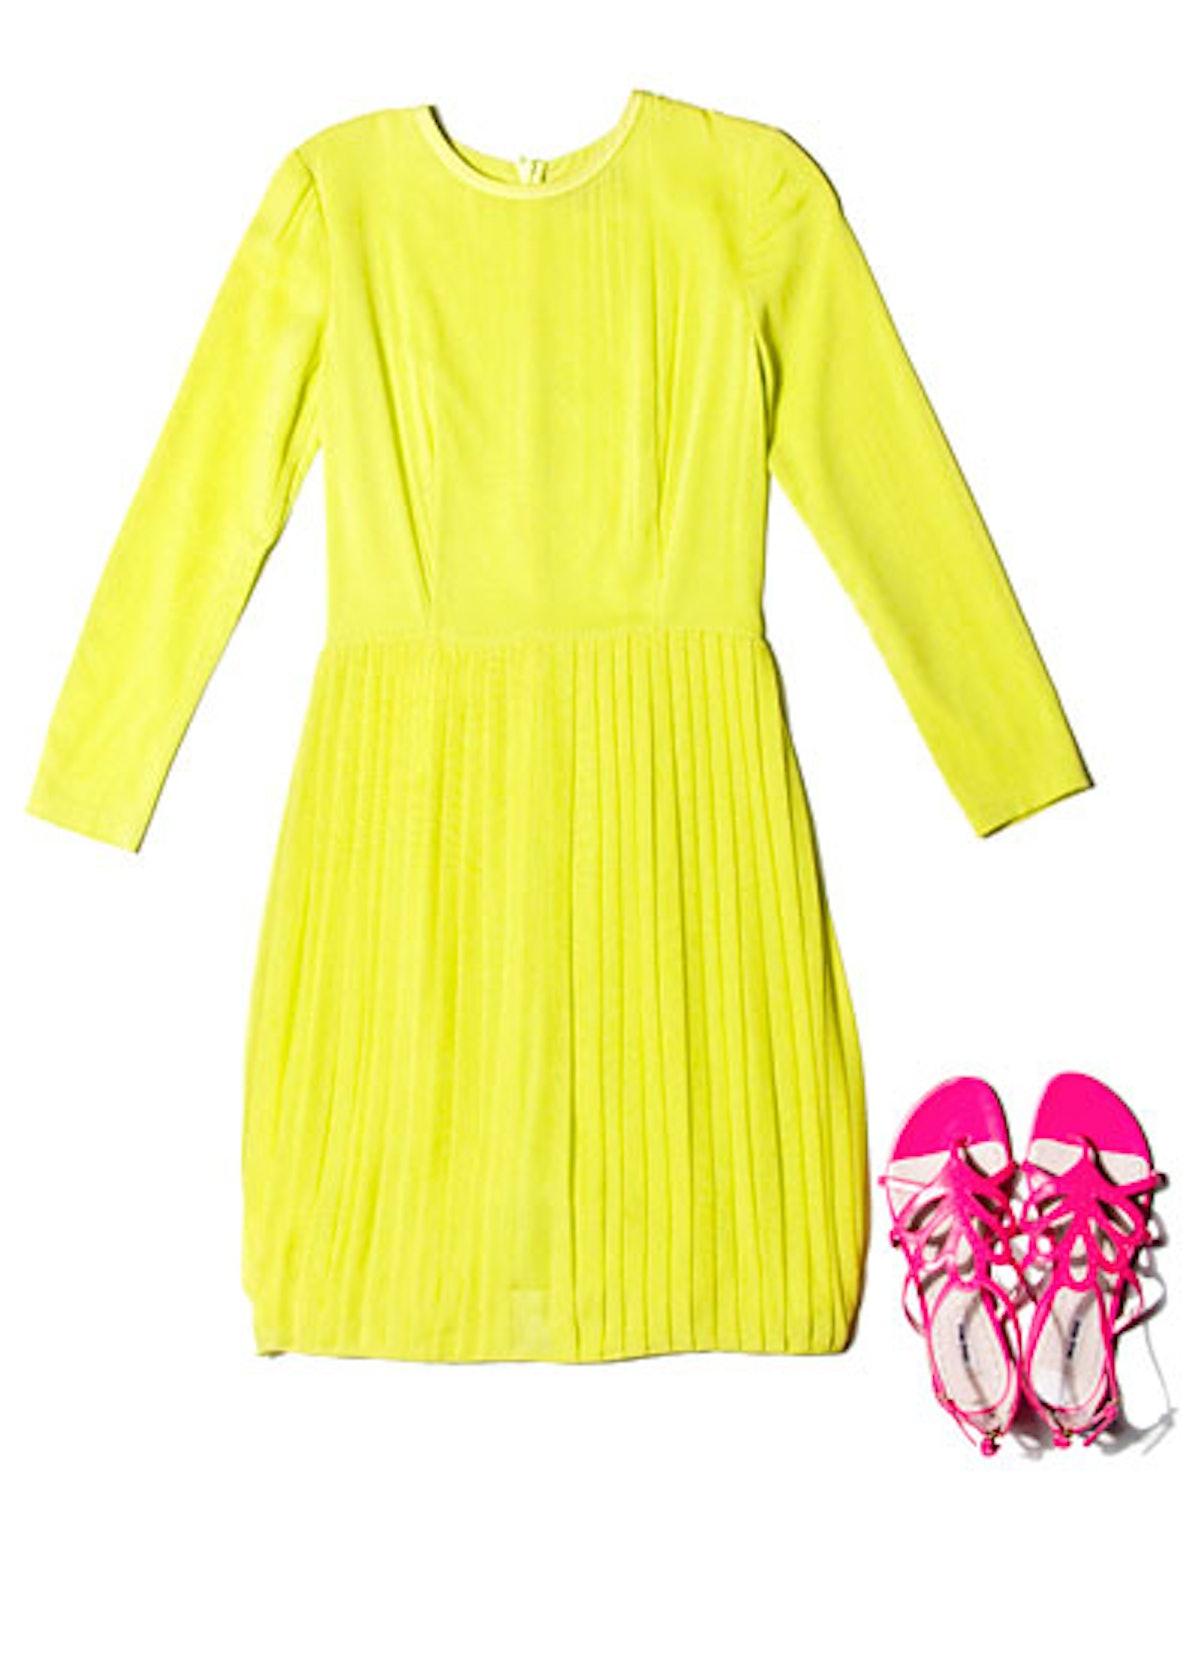 fass-spring-fashion-trends-03-v.jpg